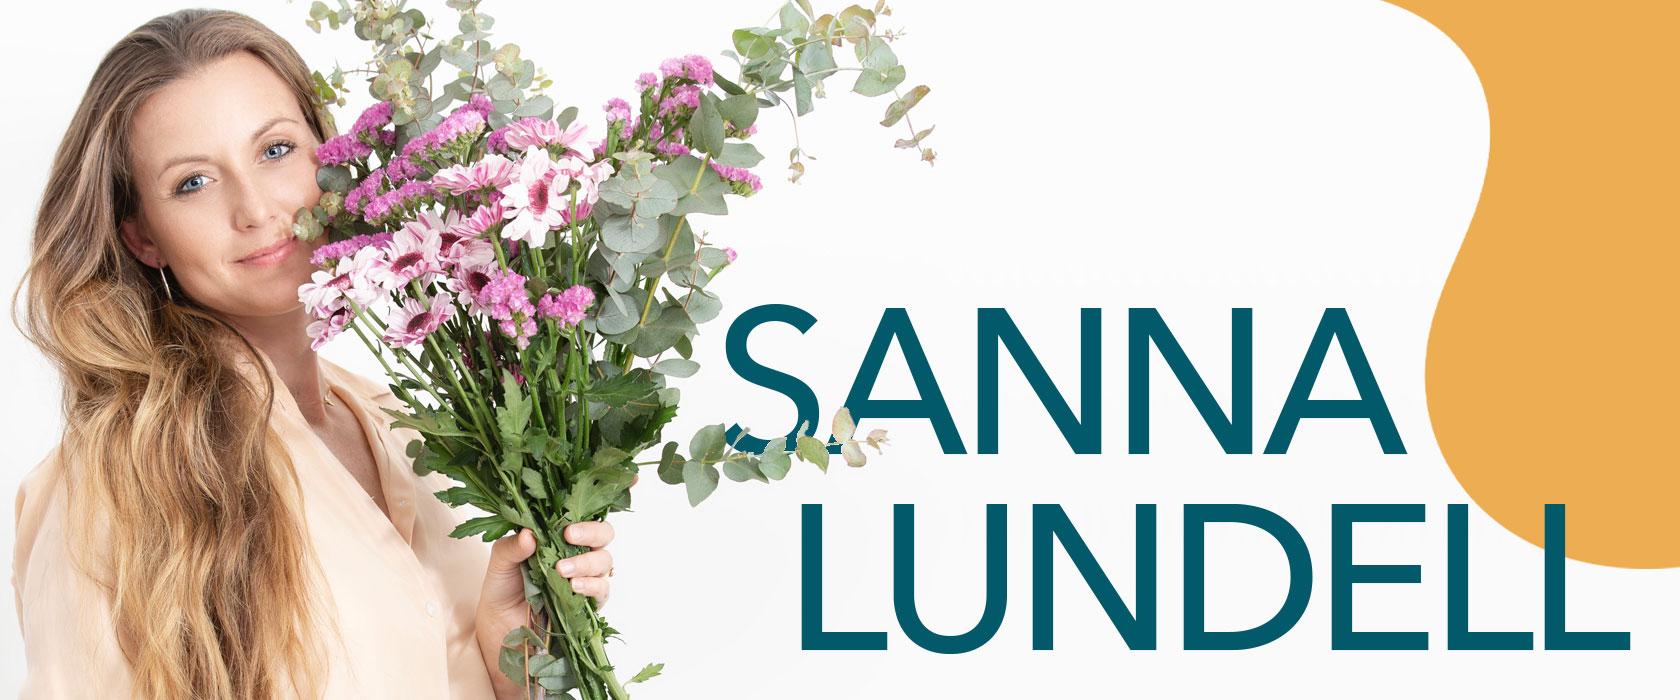 Sanna Lundell pressbild.